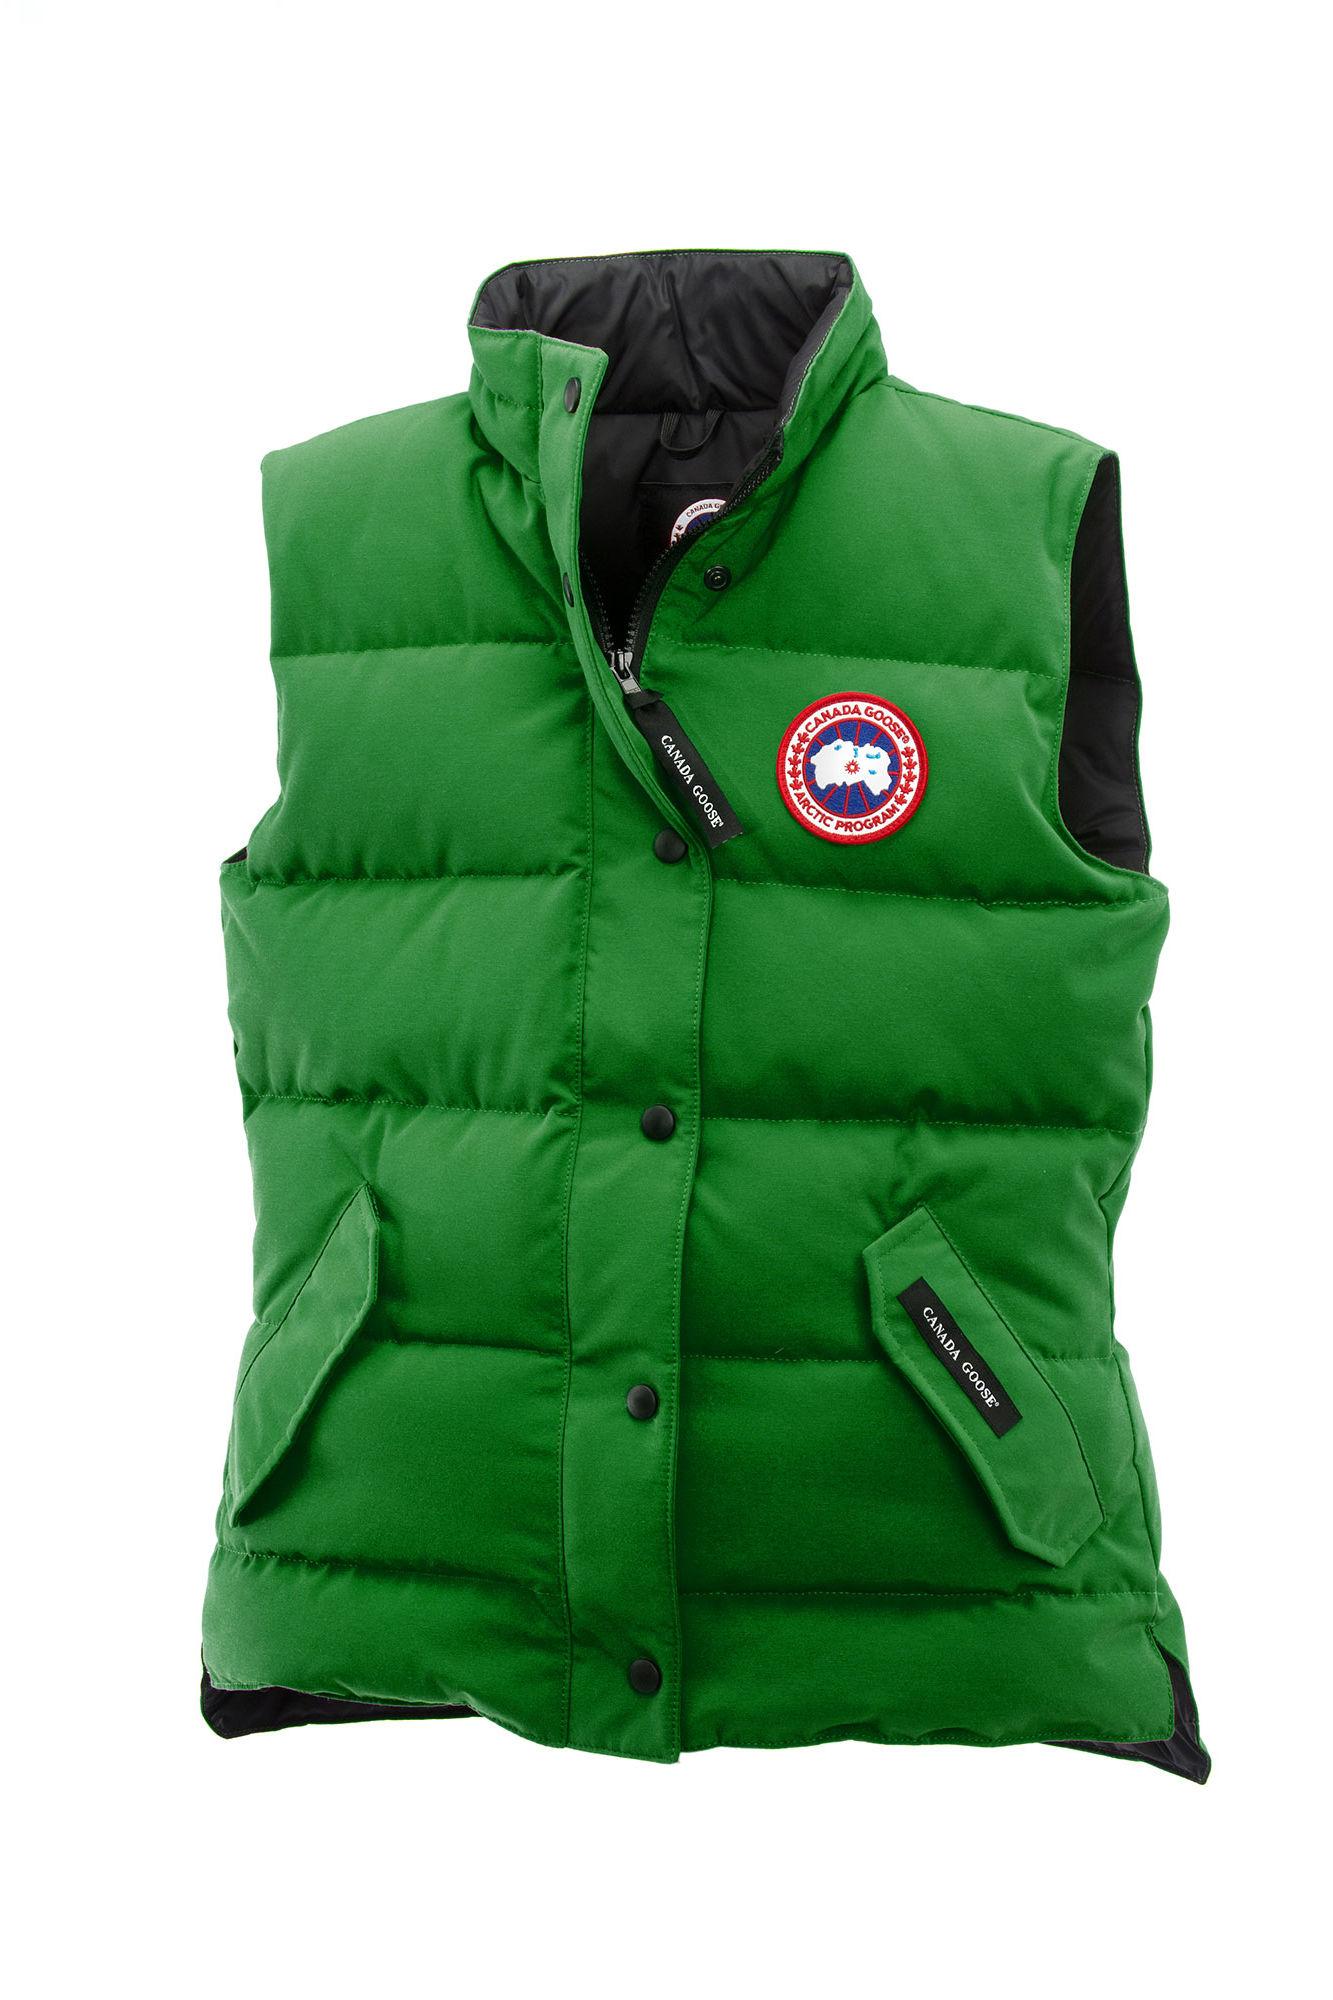 Canada Goose victoria parka replica authentic - Canada goose Freestyle Vest in Green for Men (Jade Green) | Lyst